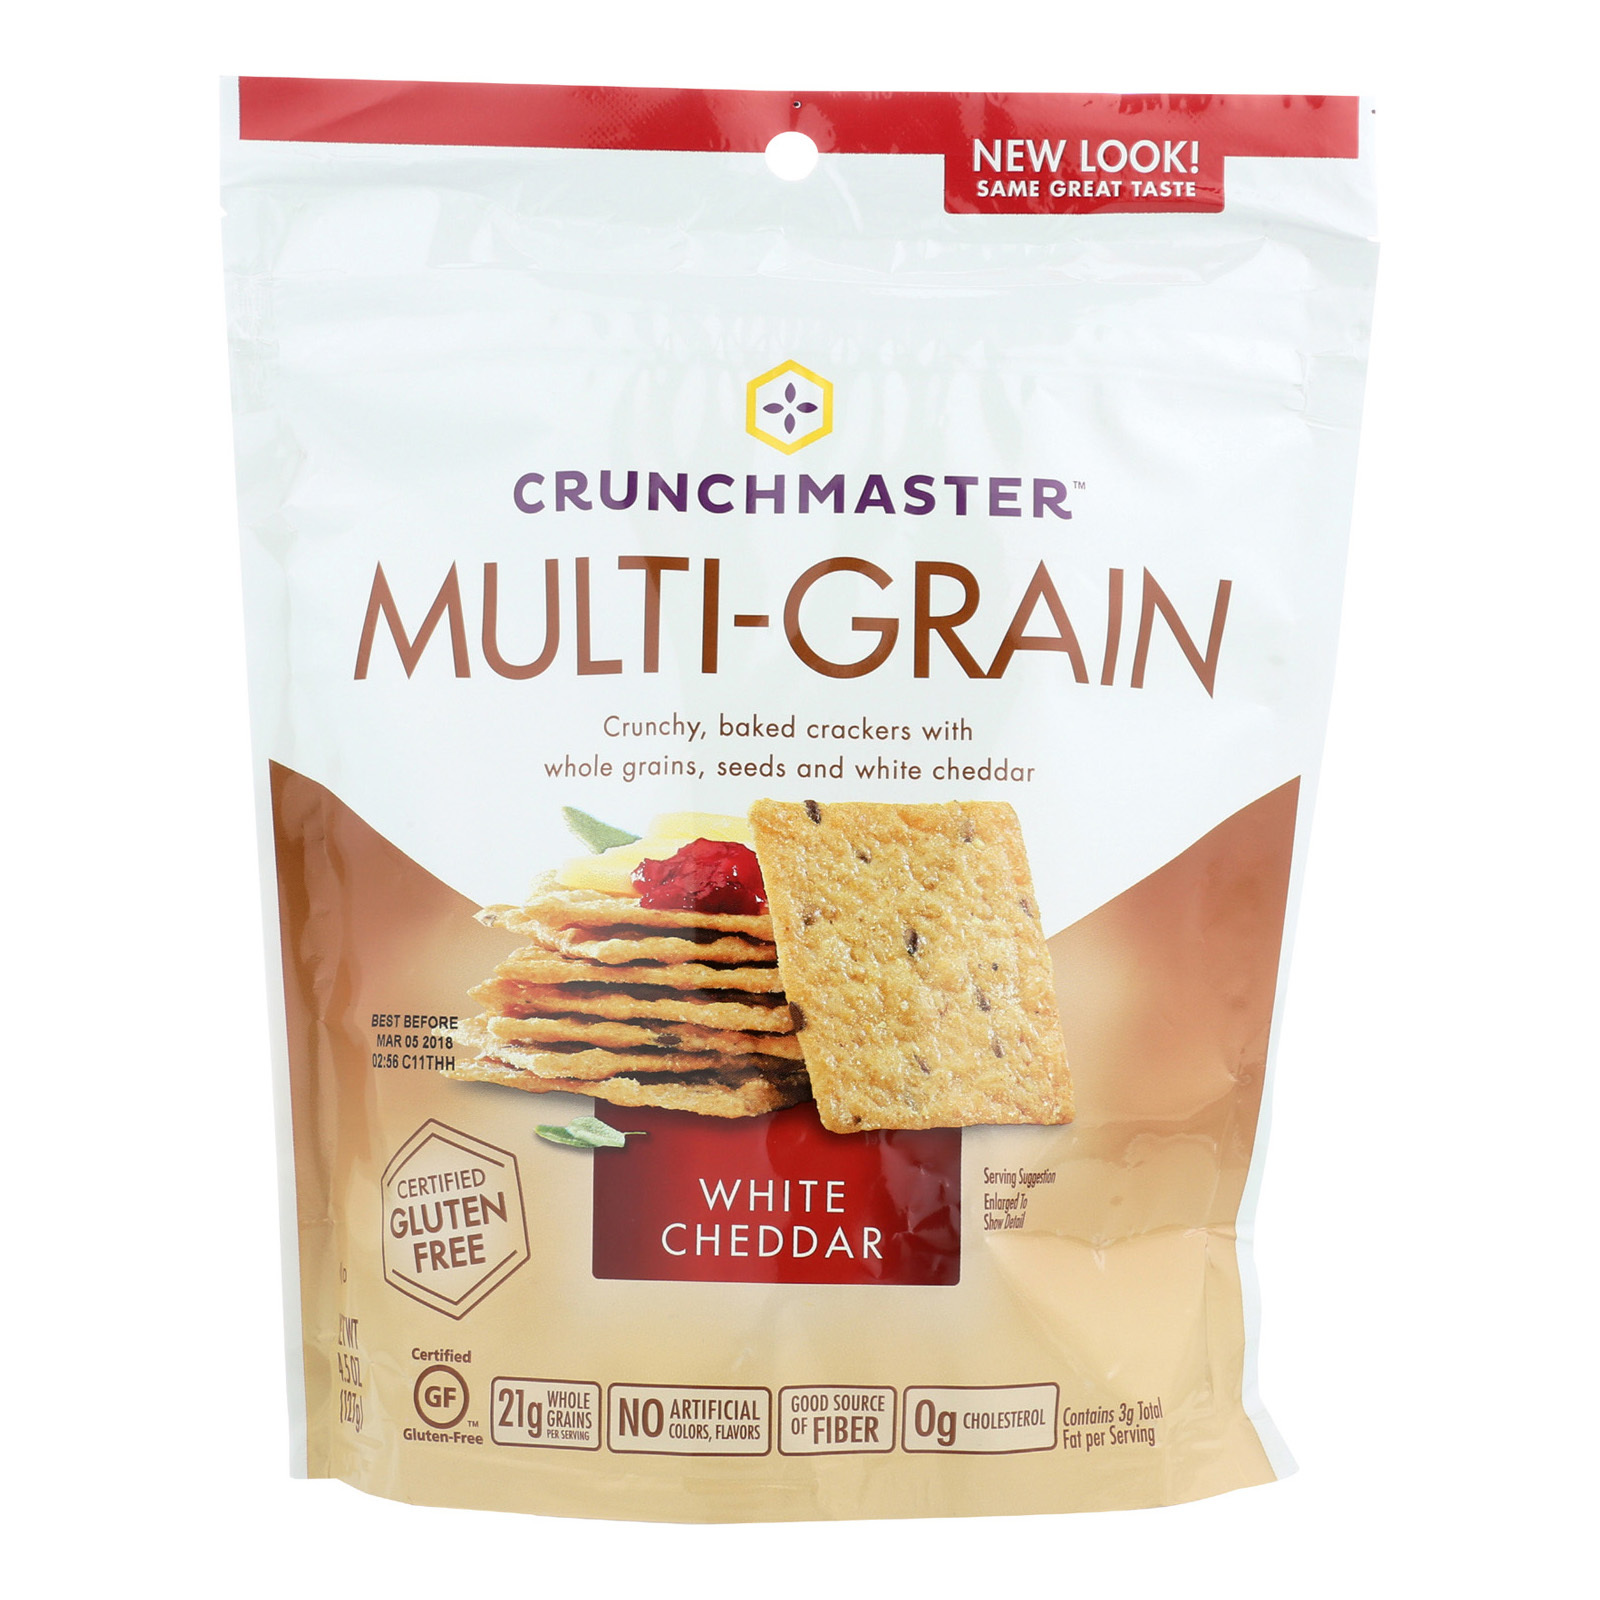 Crunchmaster Multi-Grain Crackers - White Cheddar - Case of 12 - 4.5 oz.